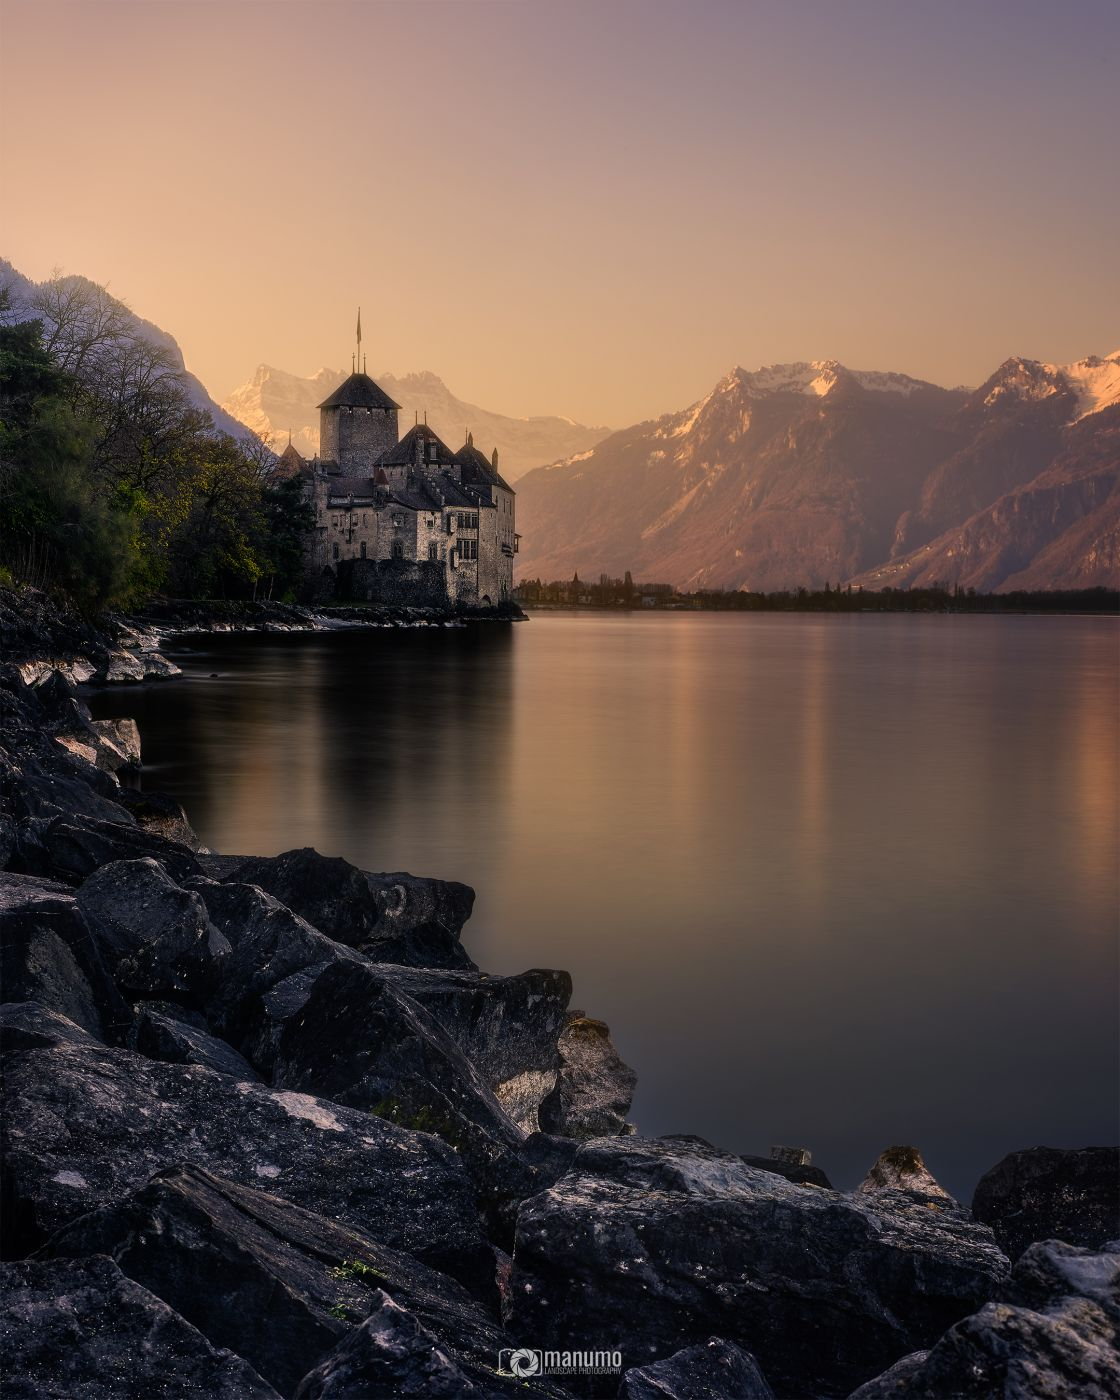 Castle of Chillon, Switzerland